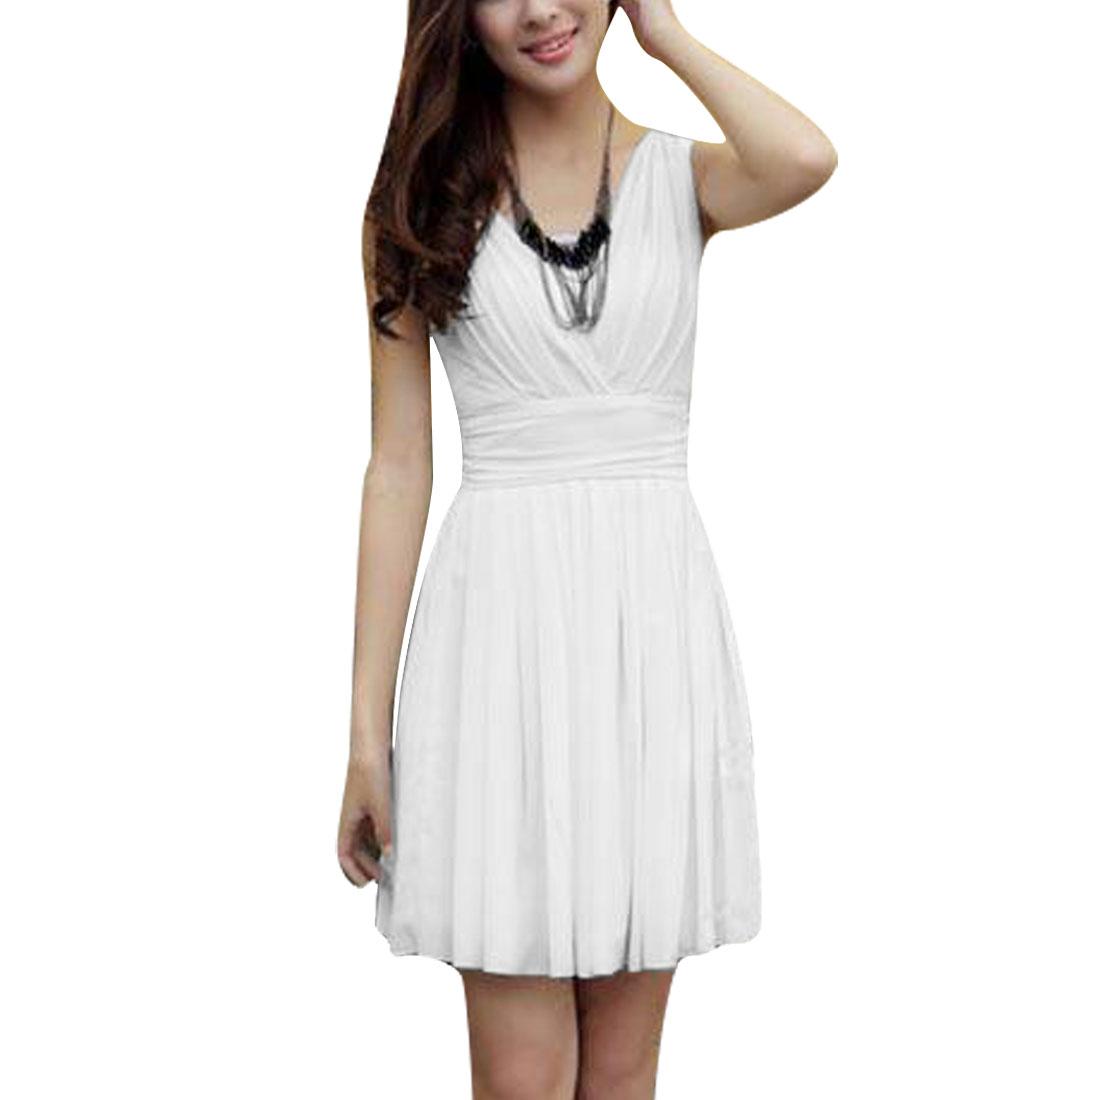 Ladies Deep V Neck Zip Up Back Sleeveless Lining Dress White XS